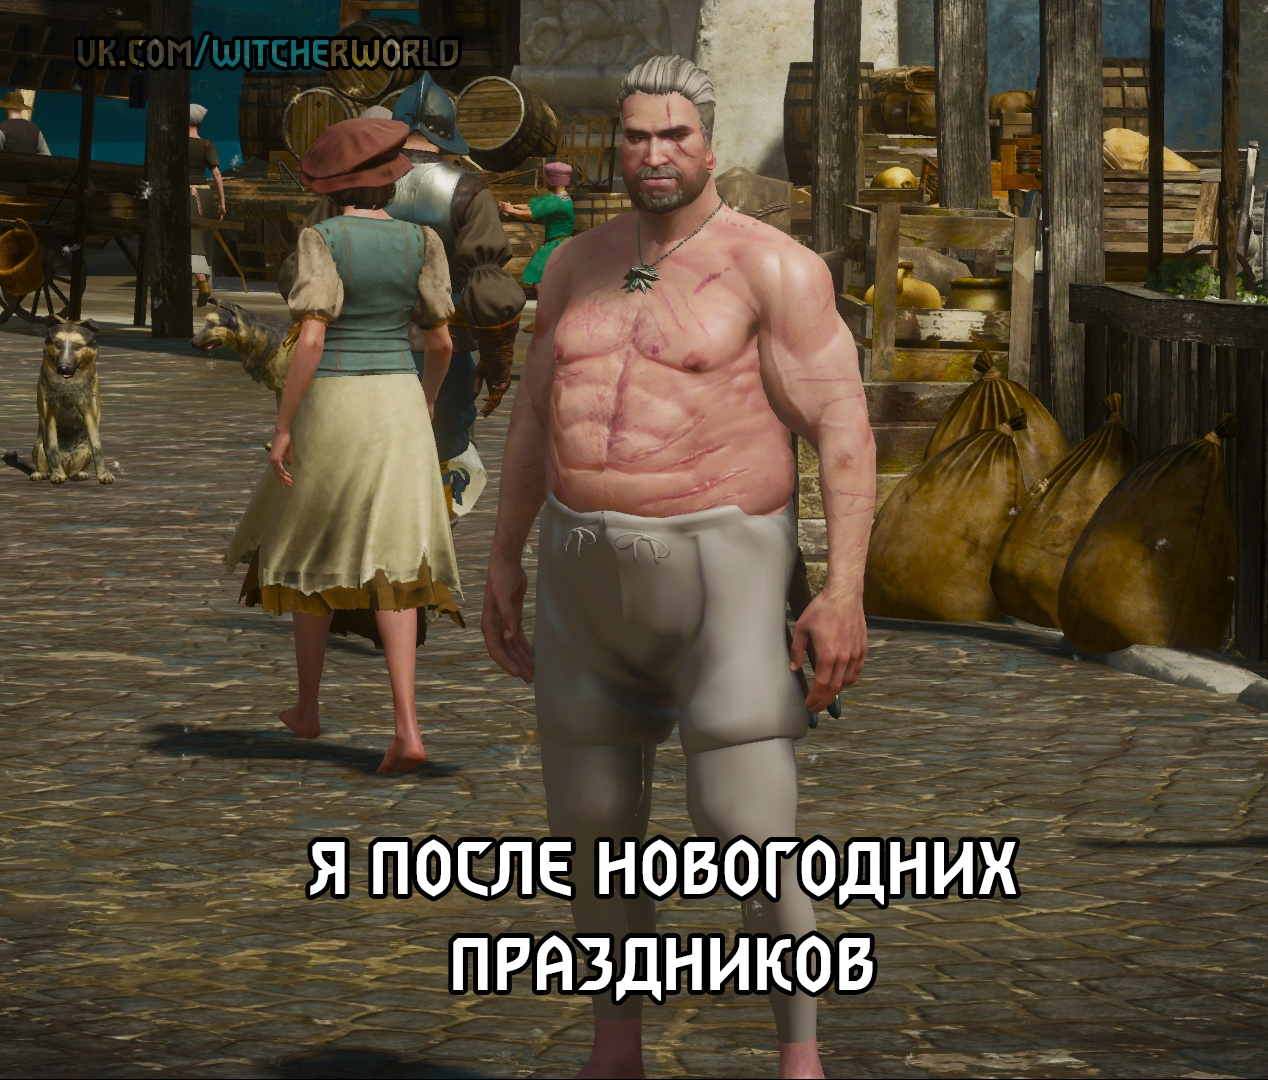 Ведьмак-Мемы - Witcher 3: Wild Hunt, the